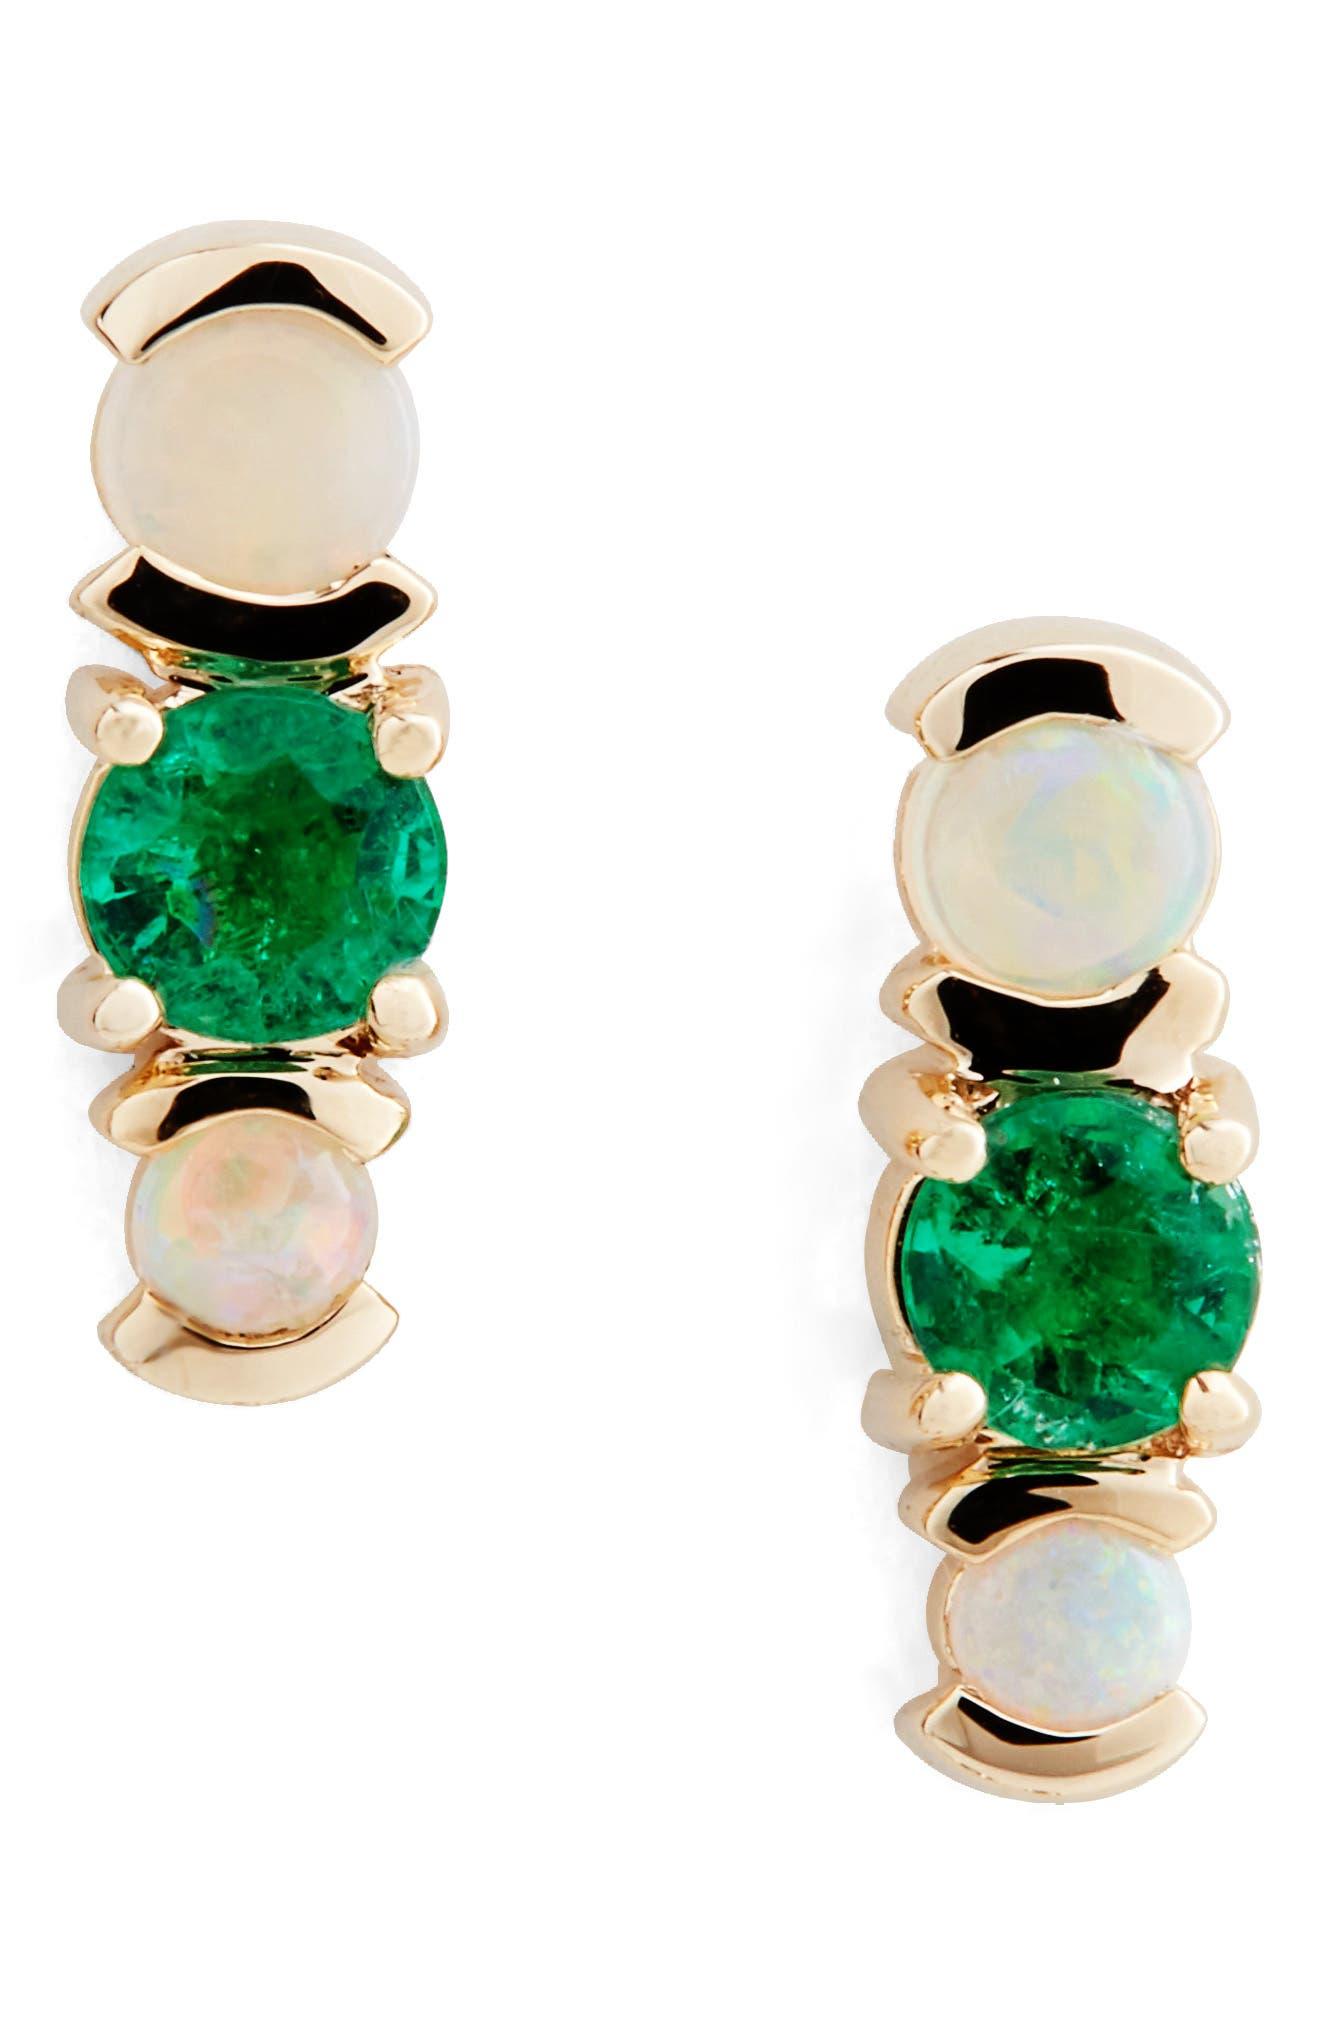 Emerald & Opal Cluster Earrings,                         Main,                         color, 340